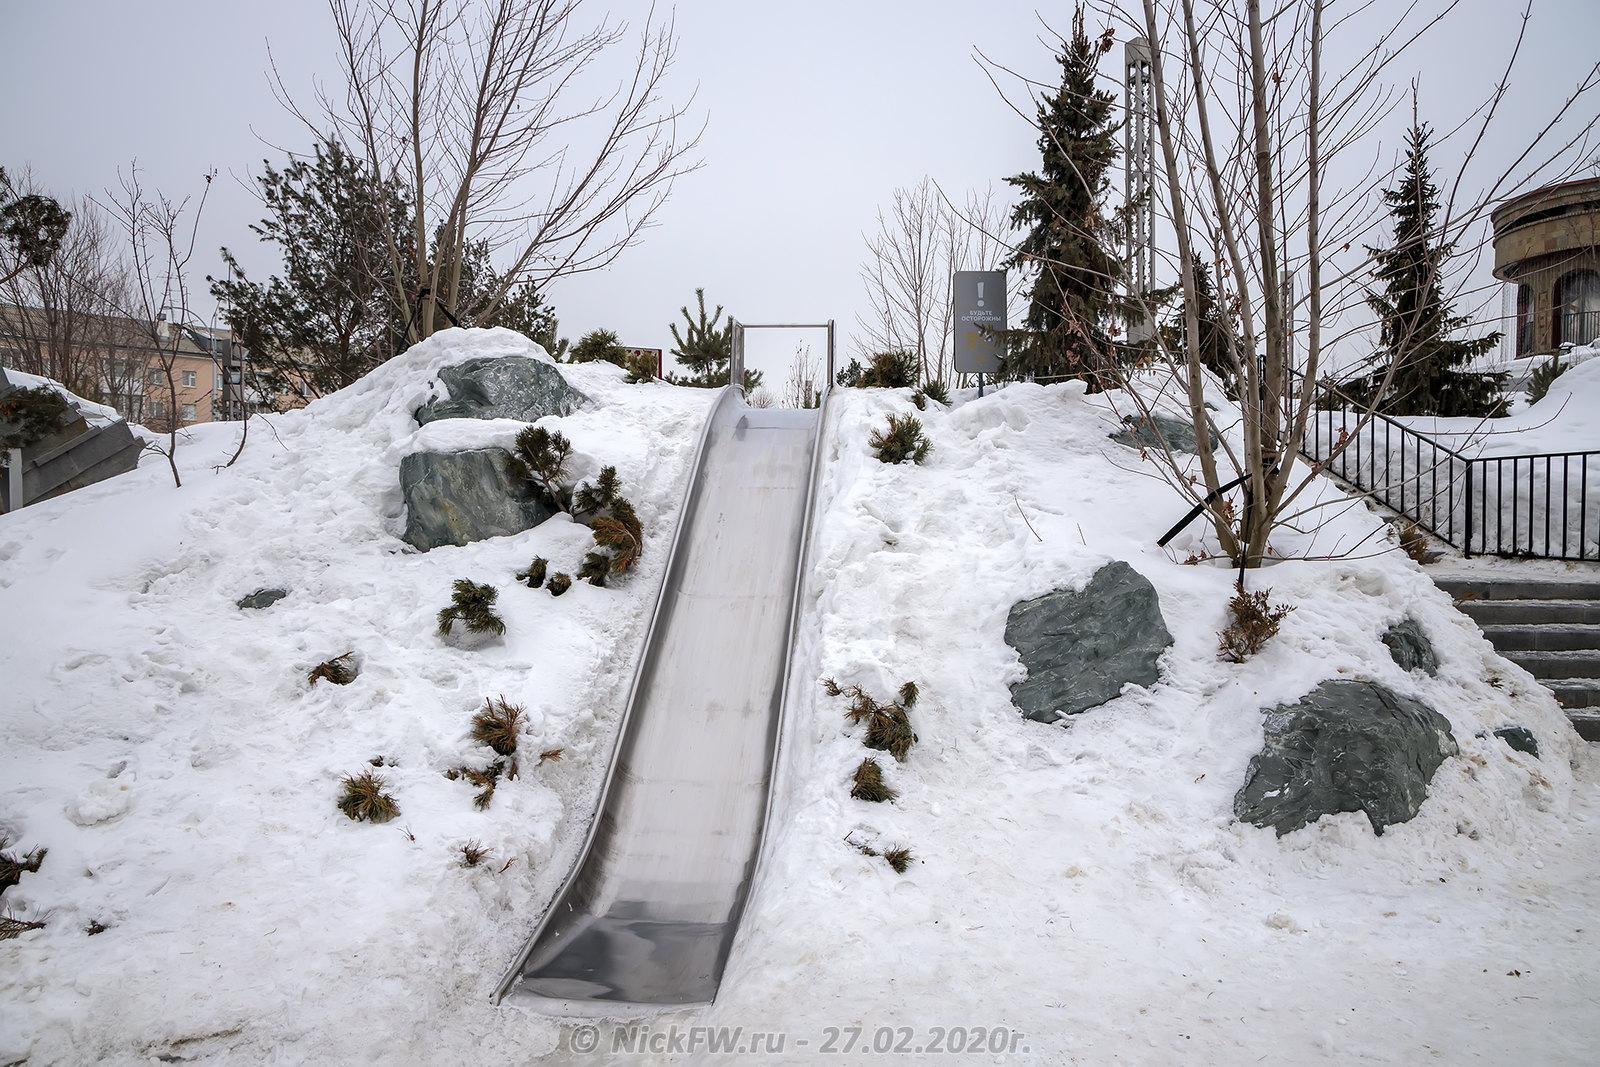 5. Горка - Парк Ангелов © NickFW.ru - 27.02.2020г.